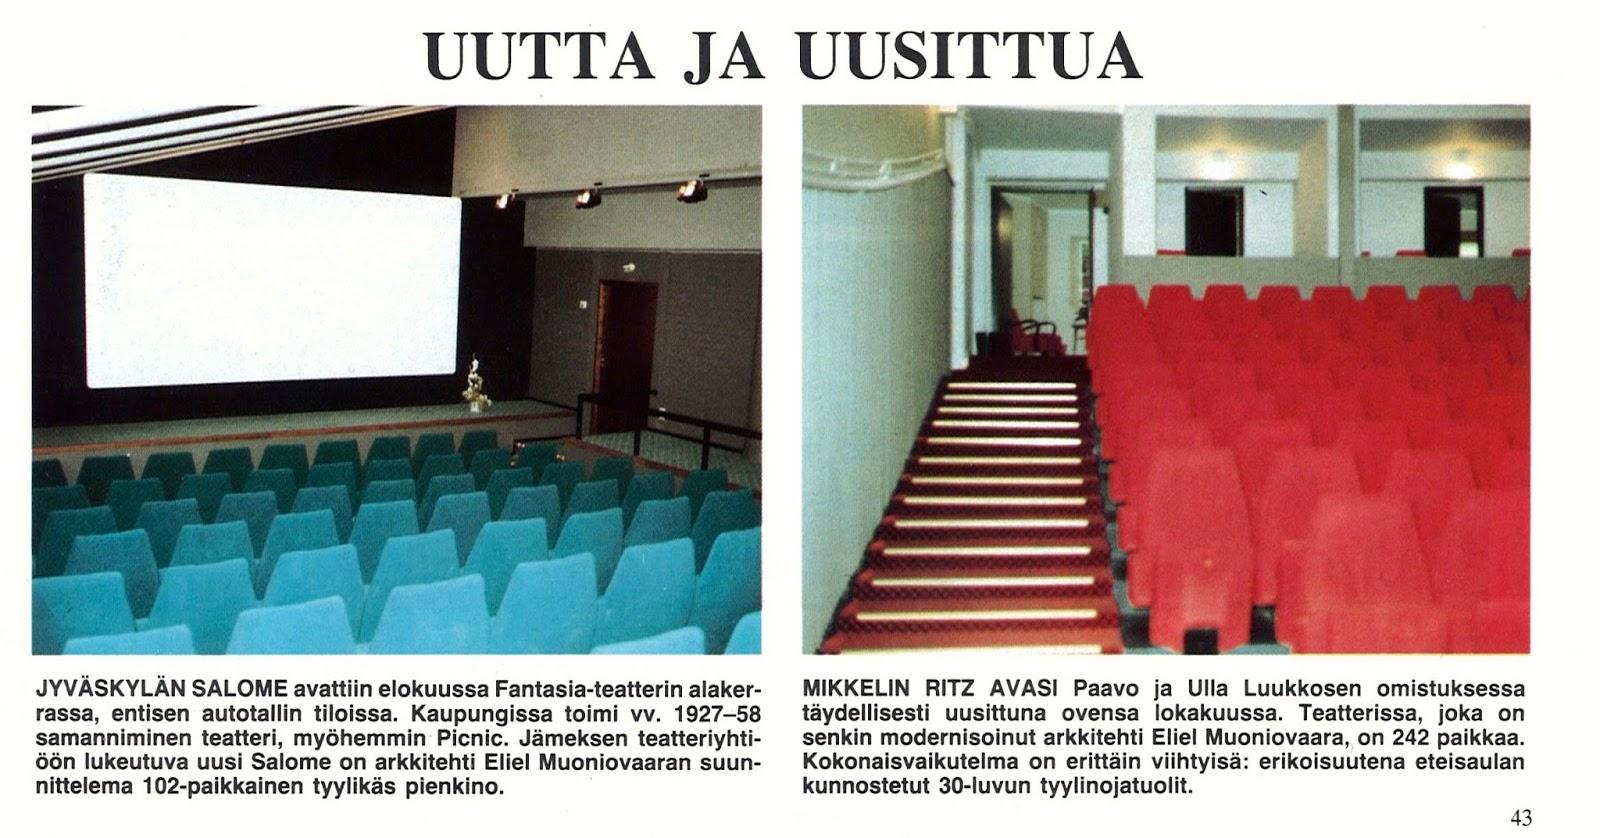 Mikkeli Ritz